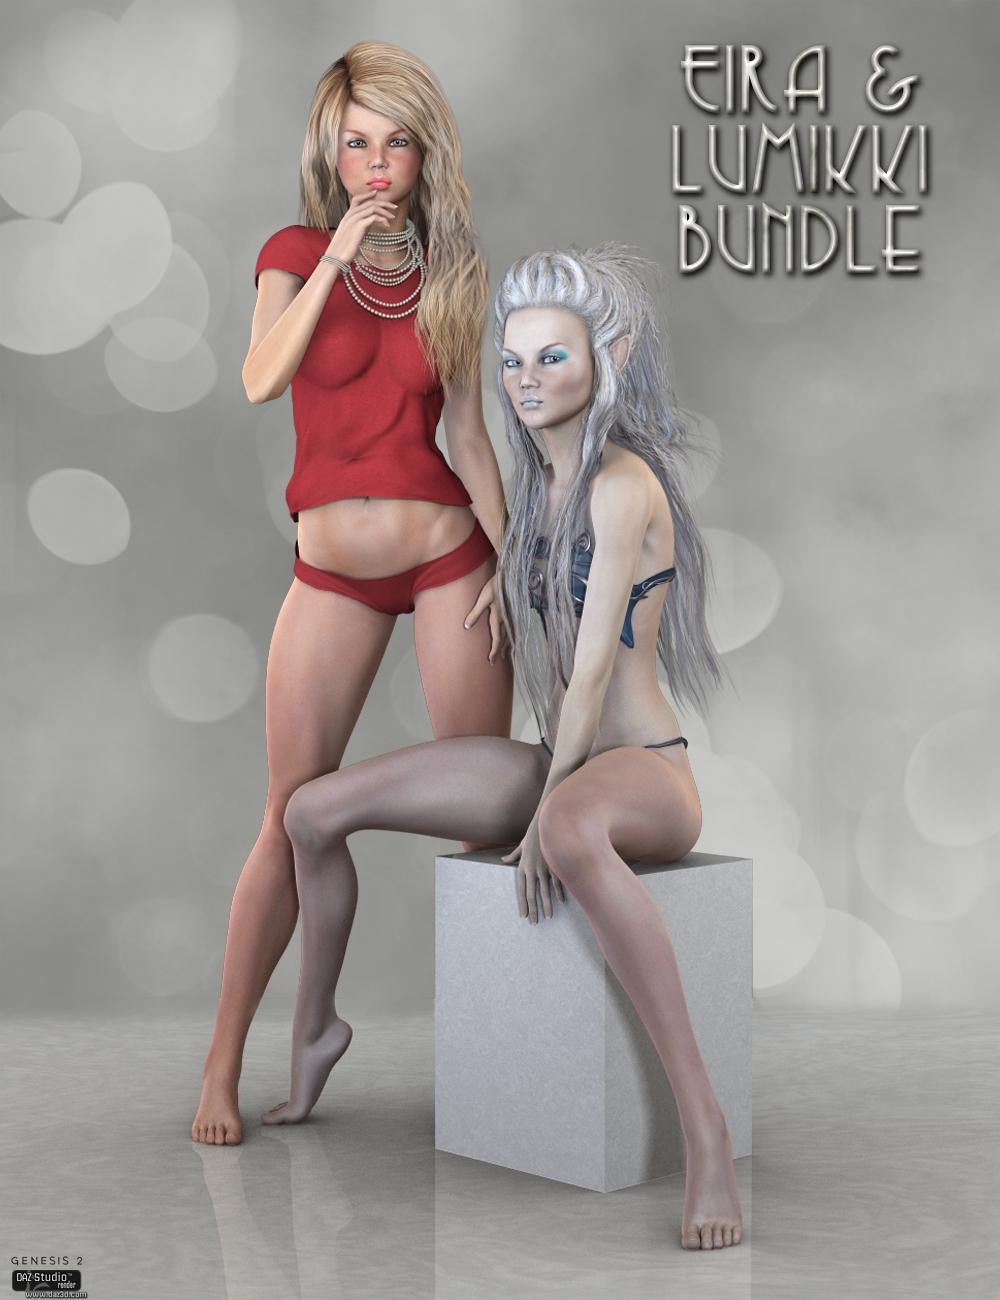 LY Eira and Lumikki Bundle by: Lyoness, 3D Models by Daz 3D